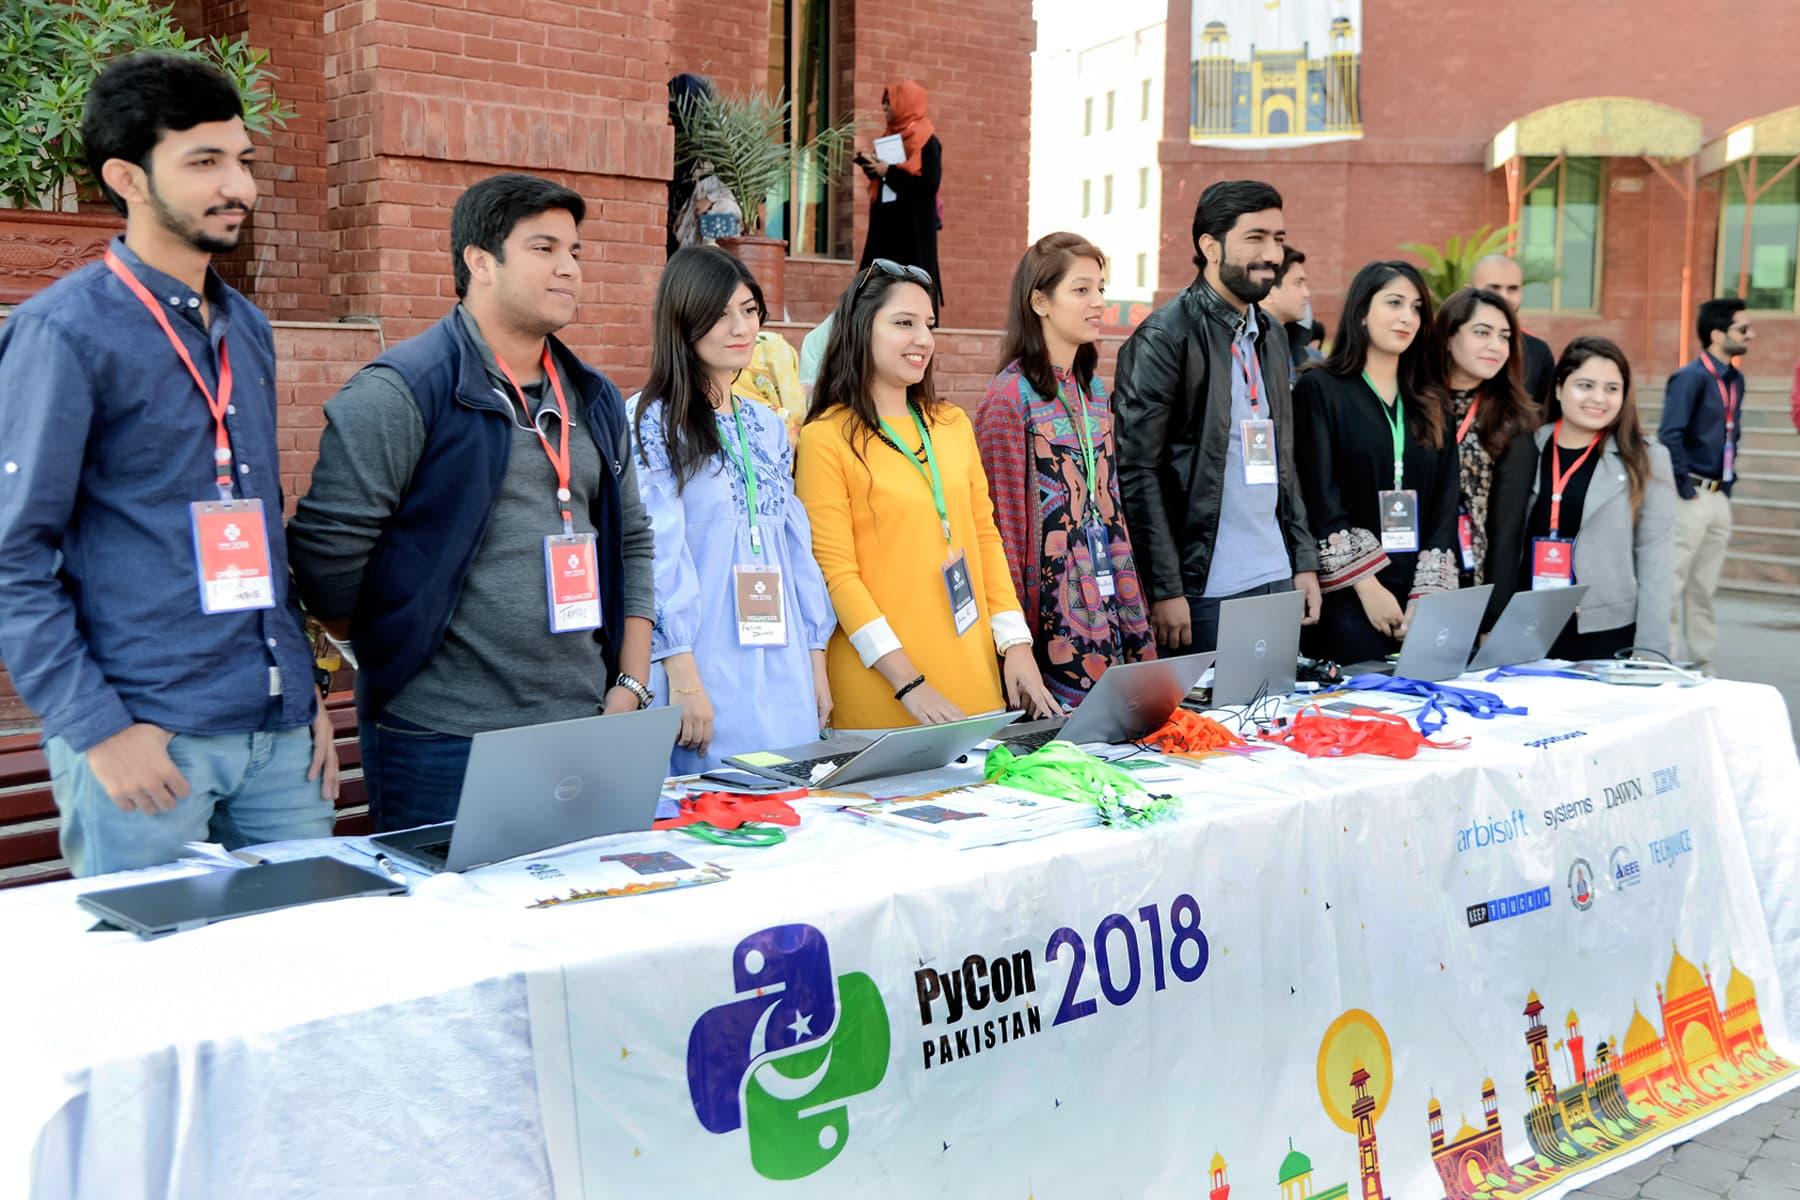 Registration desk at PyCon 2018